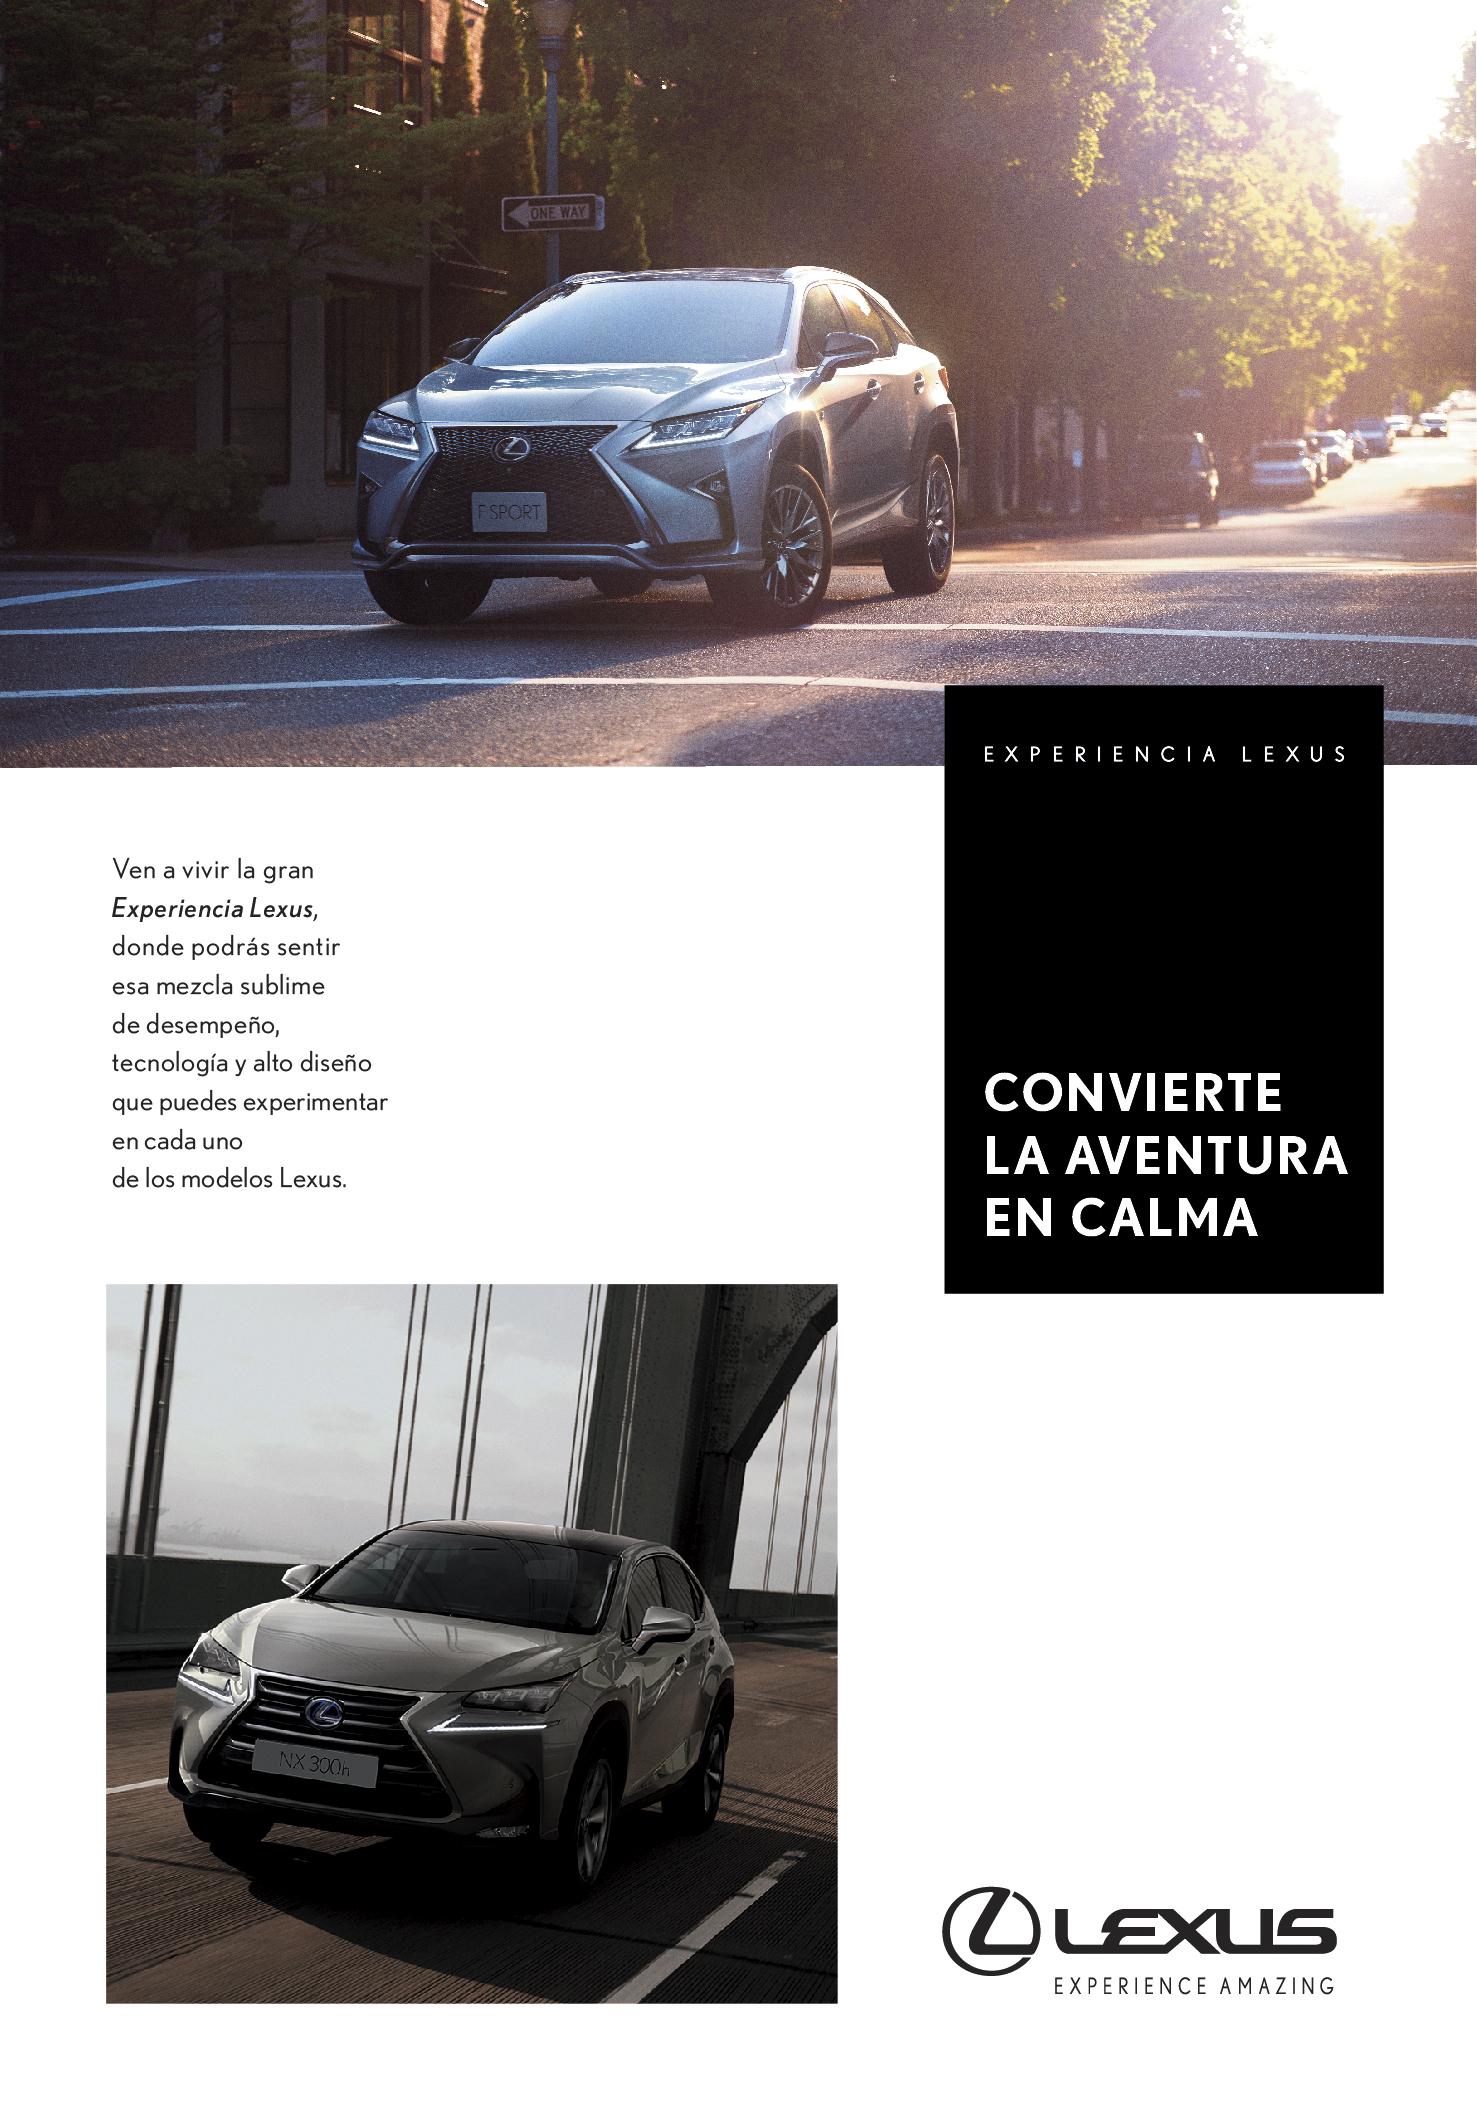 New Lexus4-14.jpg